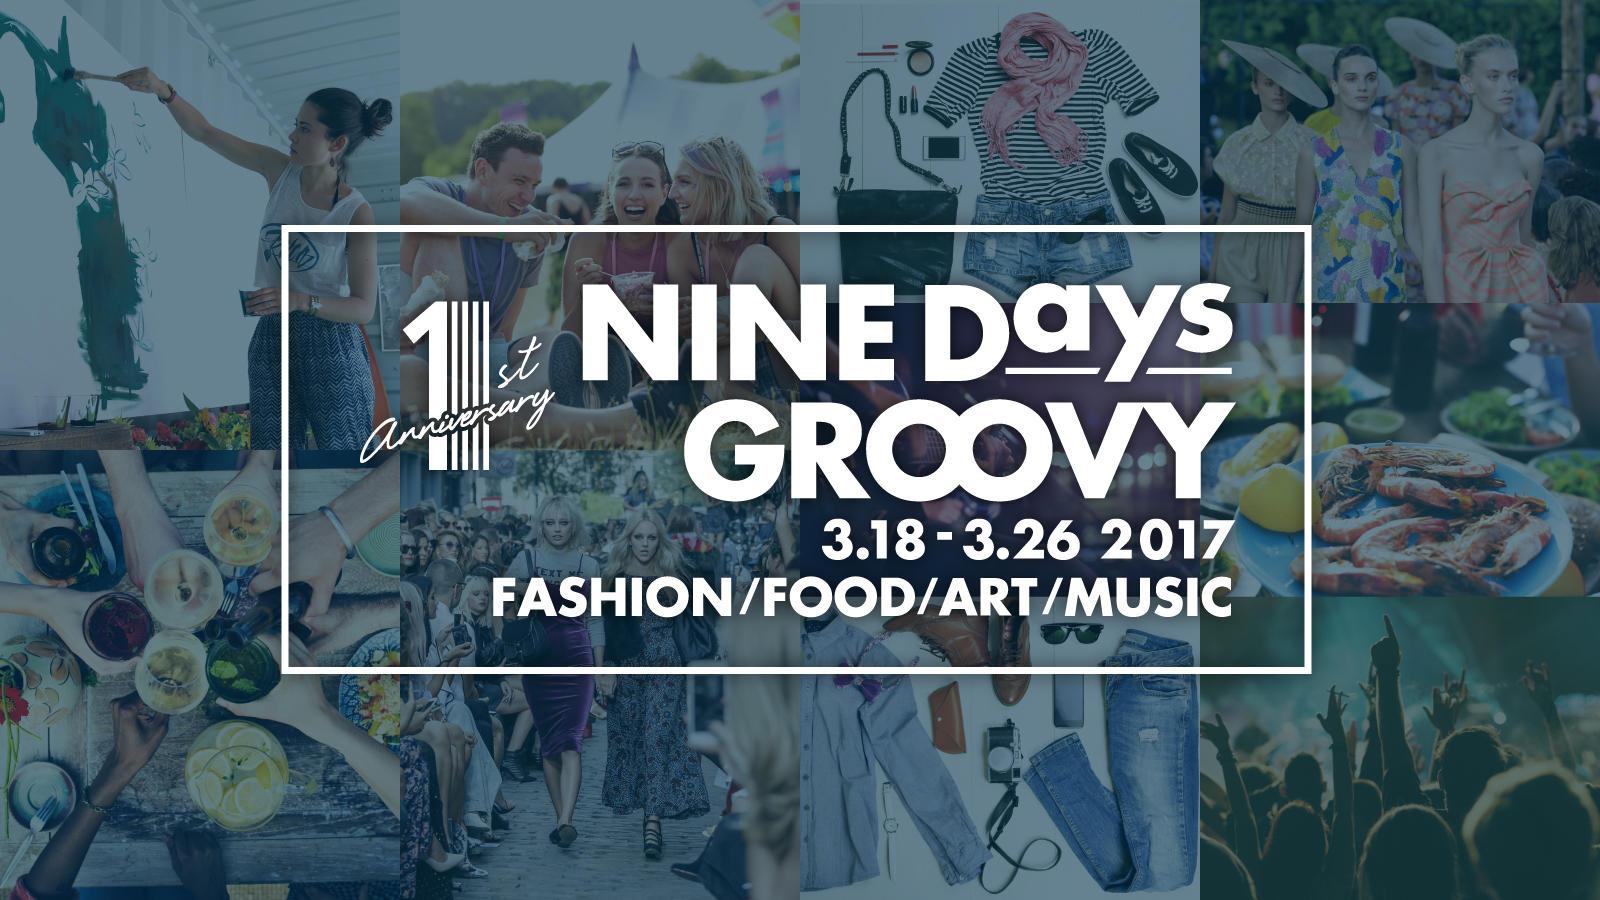 1st ANNIVERSARY 『NINE Days GROOVY』 3.18sat.~3.26sun